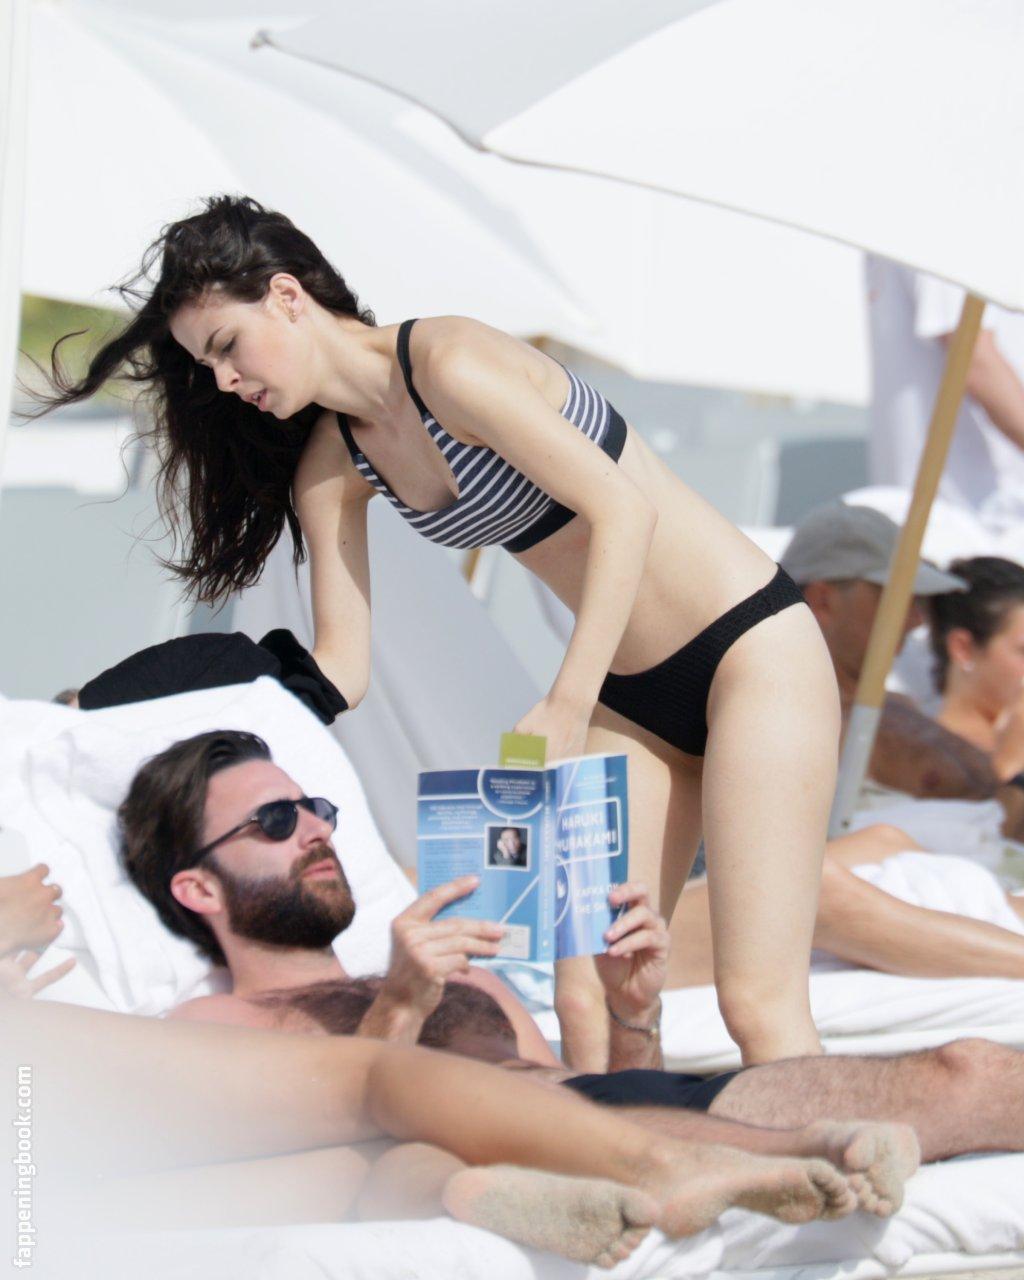 Lena meyer landrut nackt bikini